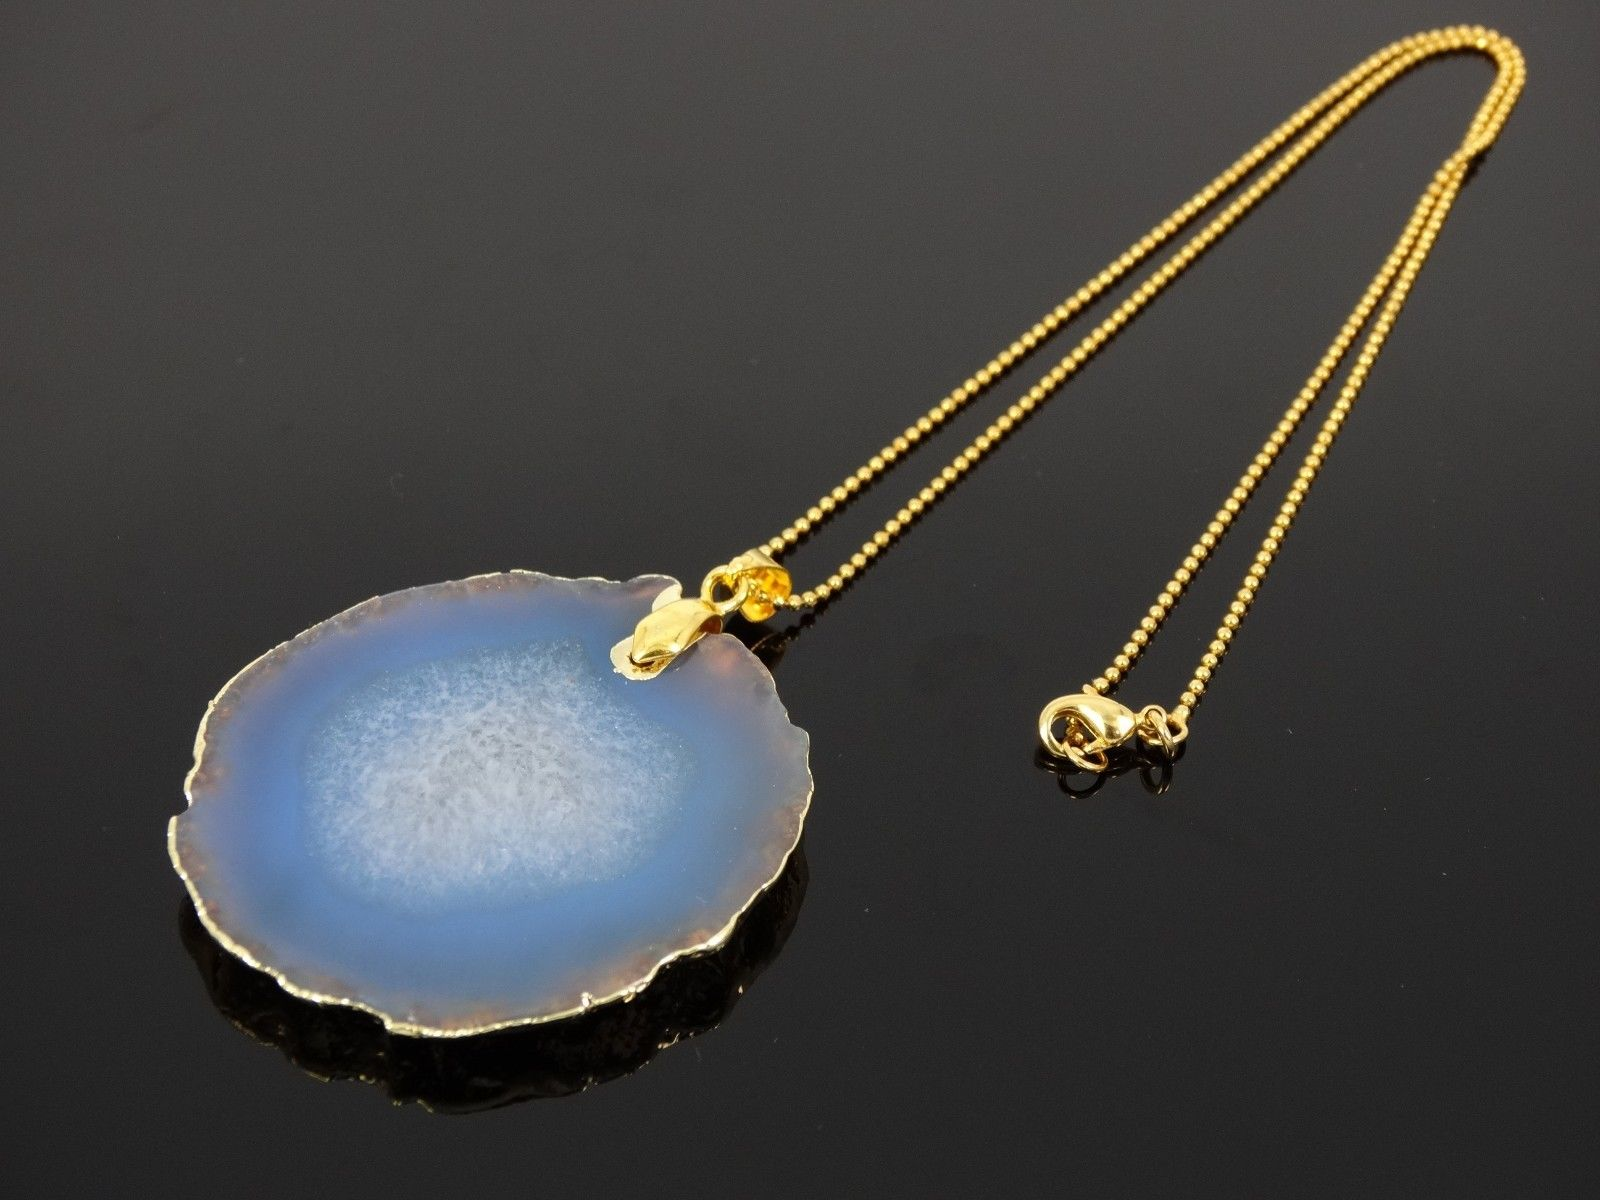 Natural Druzy Quartz Agate Gemstone Sliced Pendant Charm